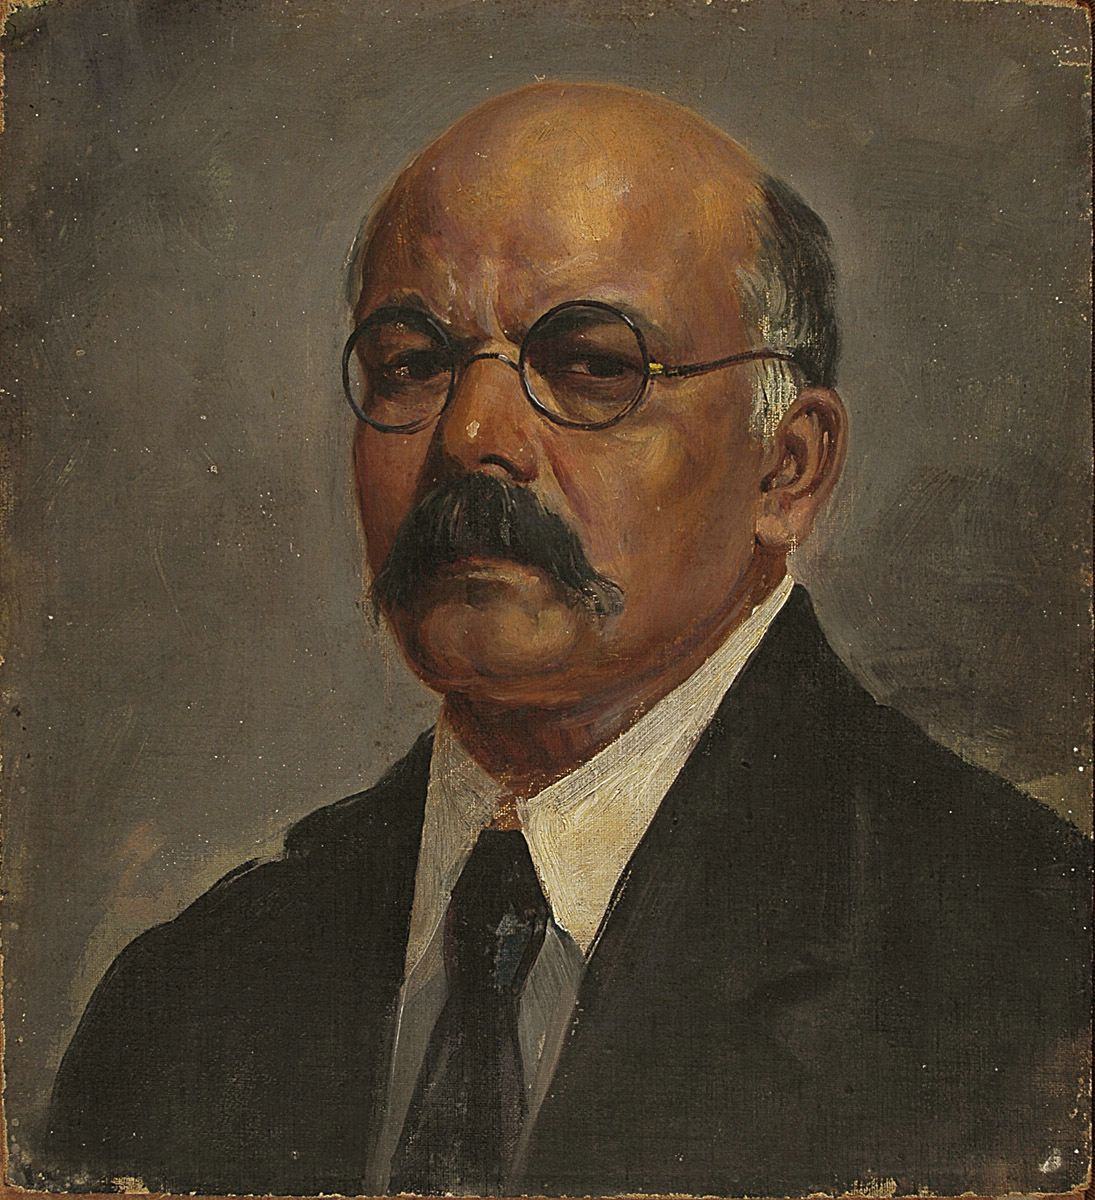 Painter Self-Portraits